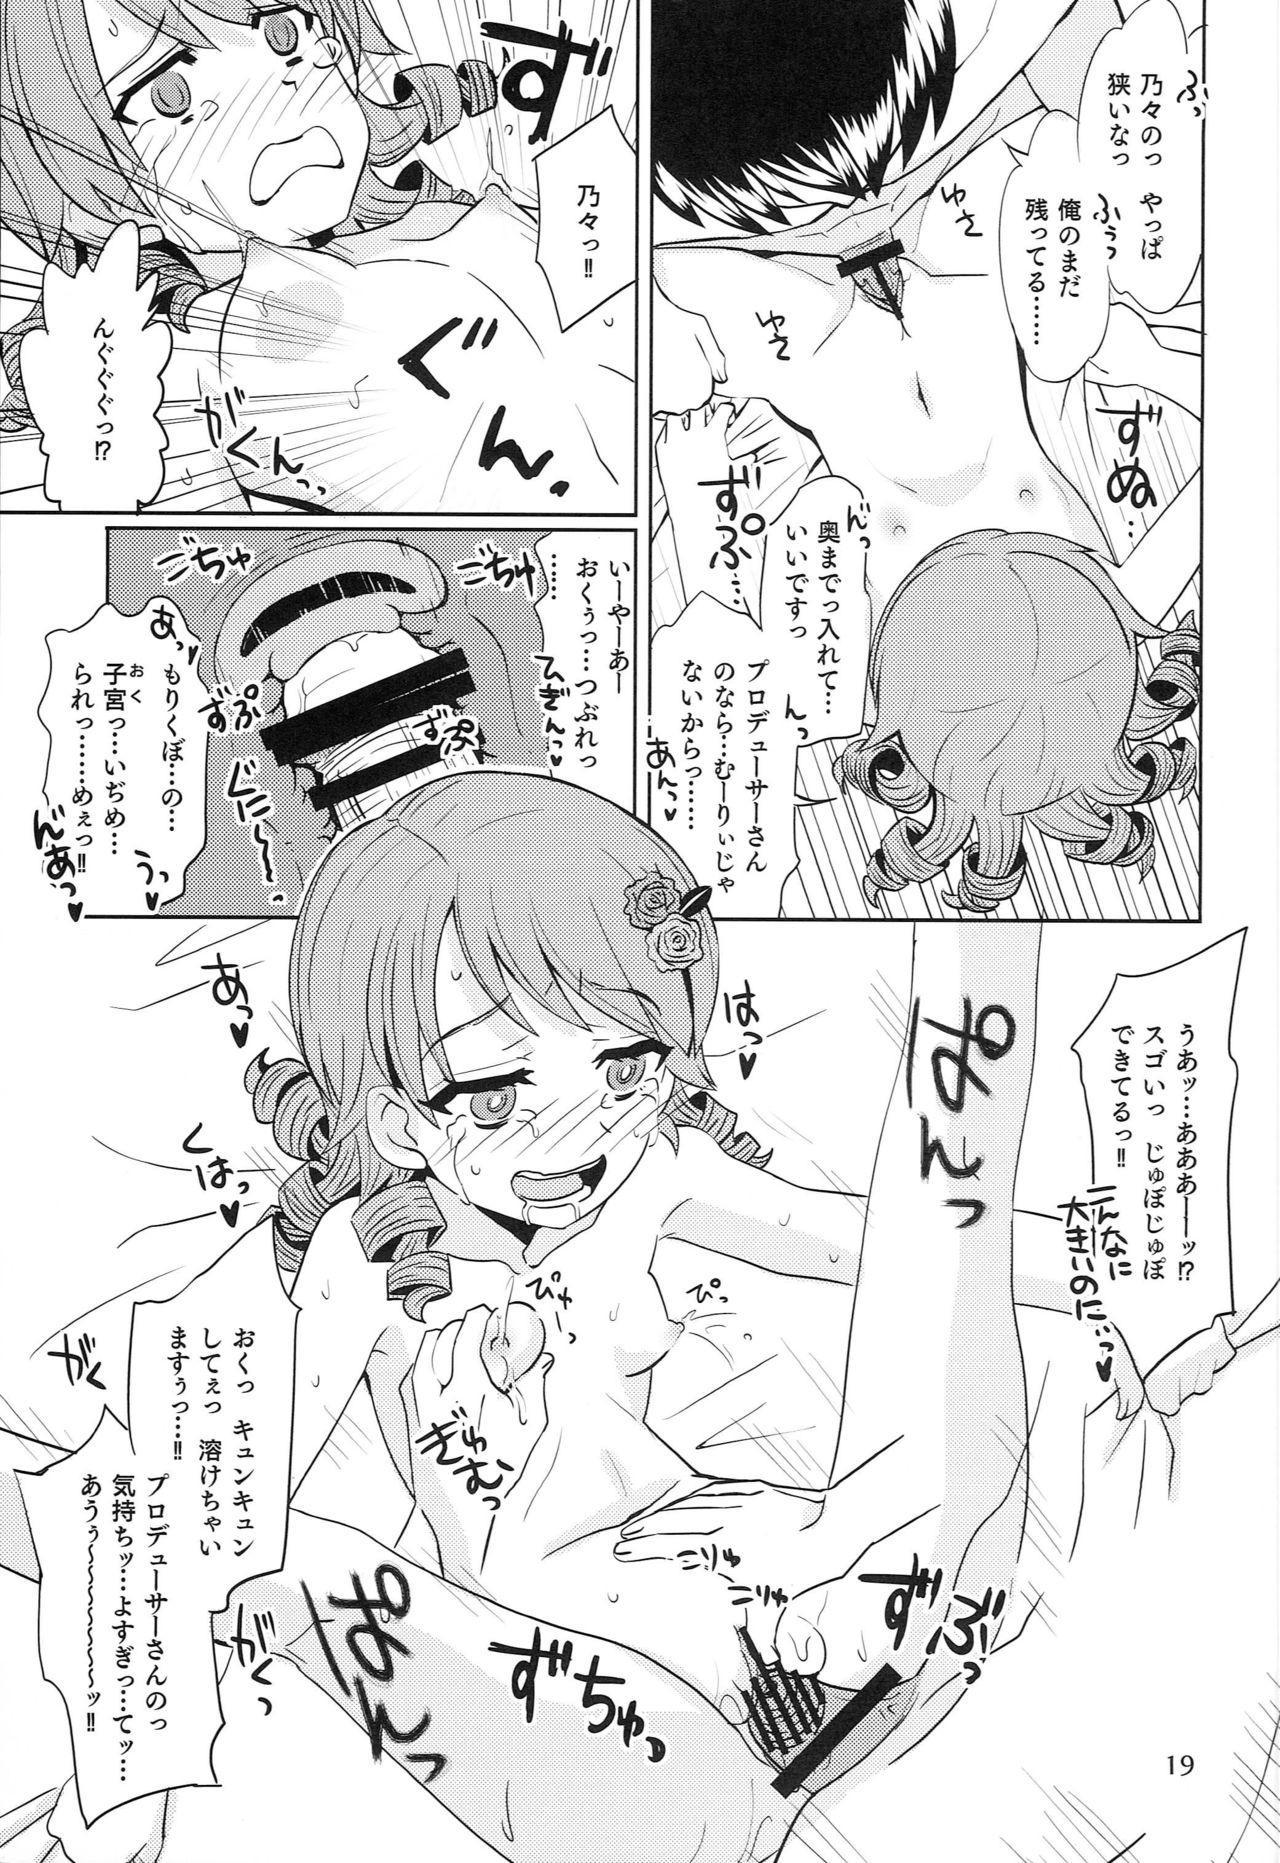 [Nekousa Pudding (Ra-men)] Muri! Muri! Mu-ri-! (THE IDOLM@STER CINDERELLA GIRLS) 17